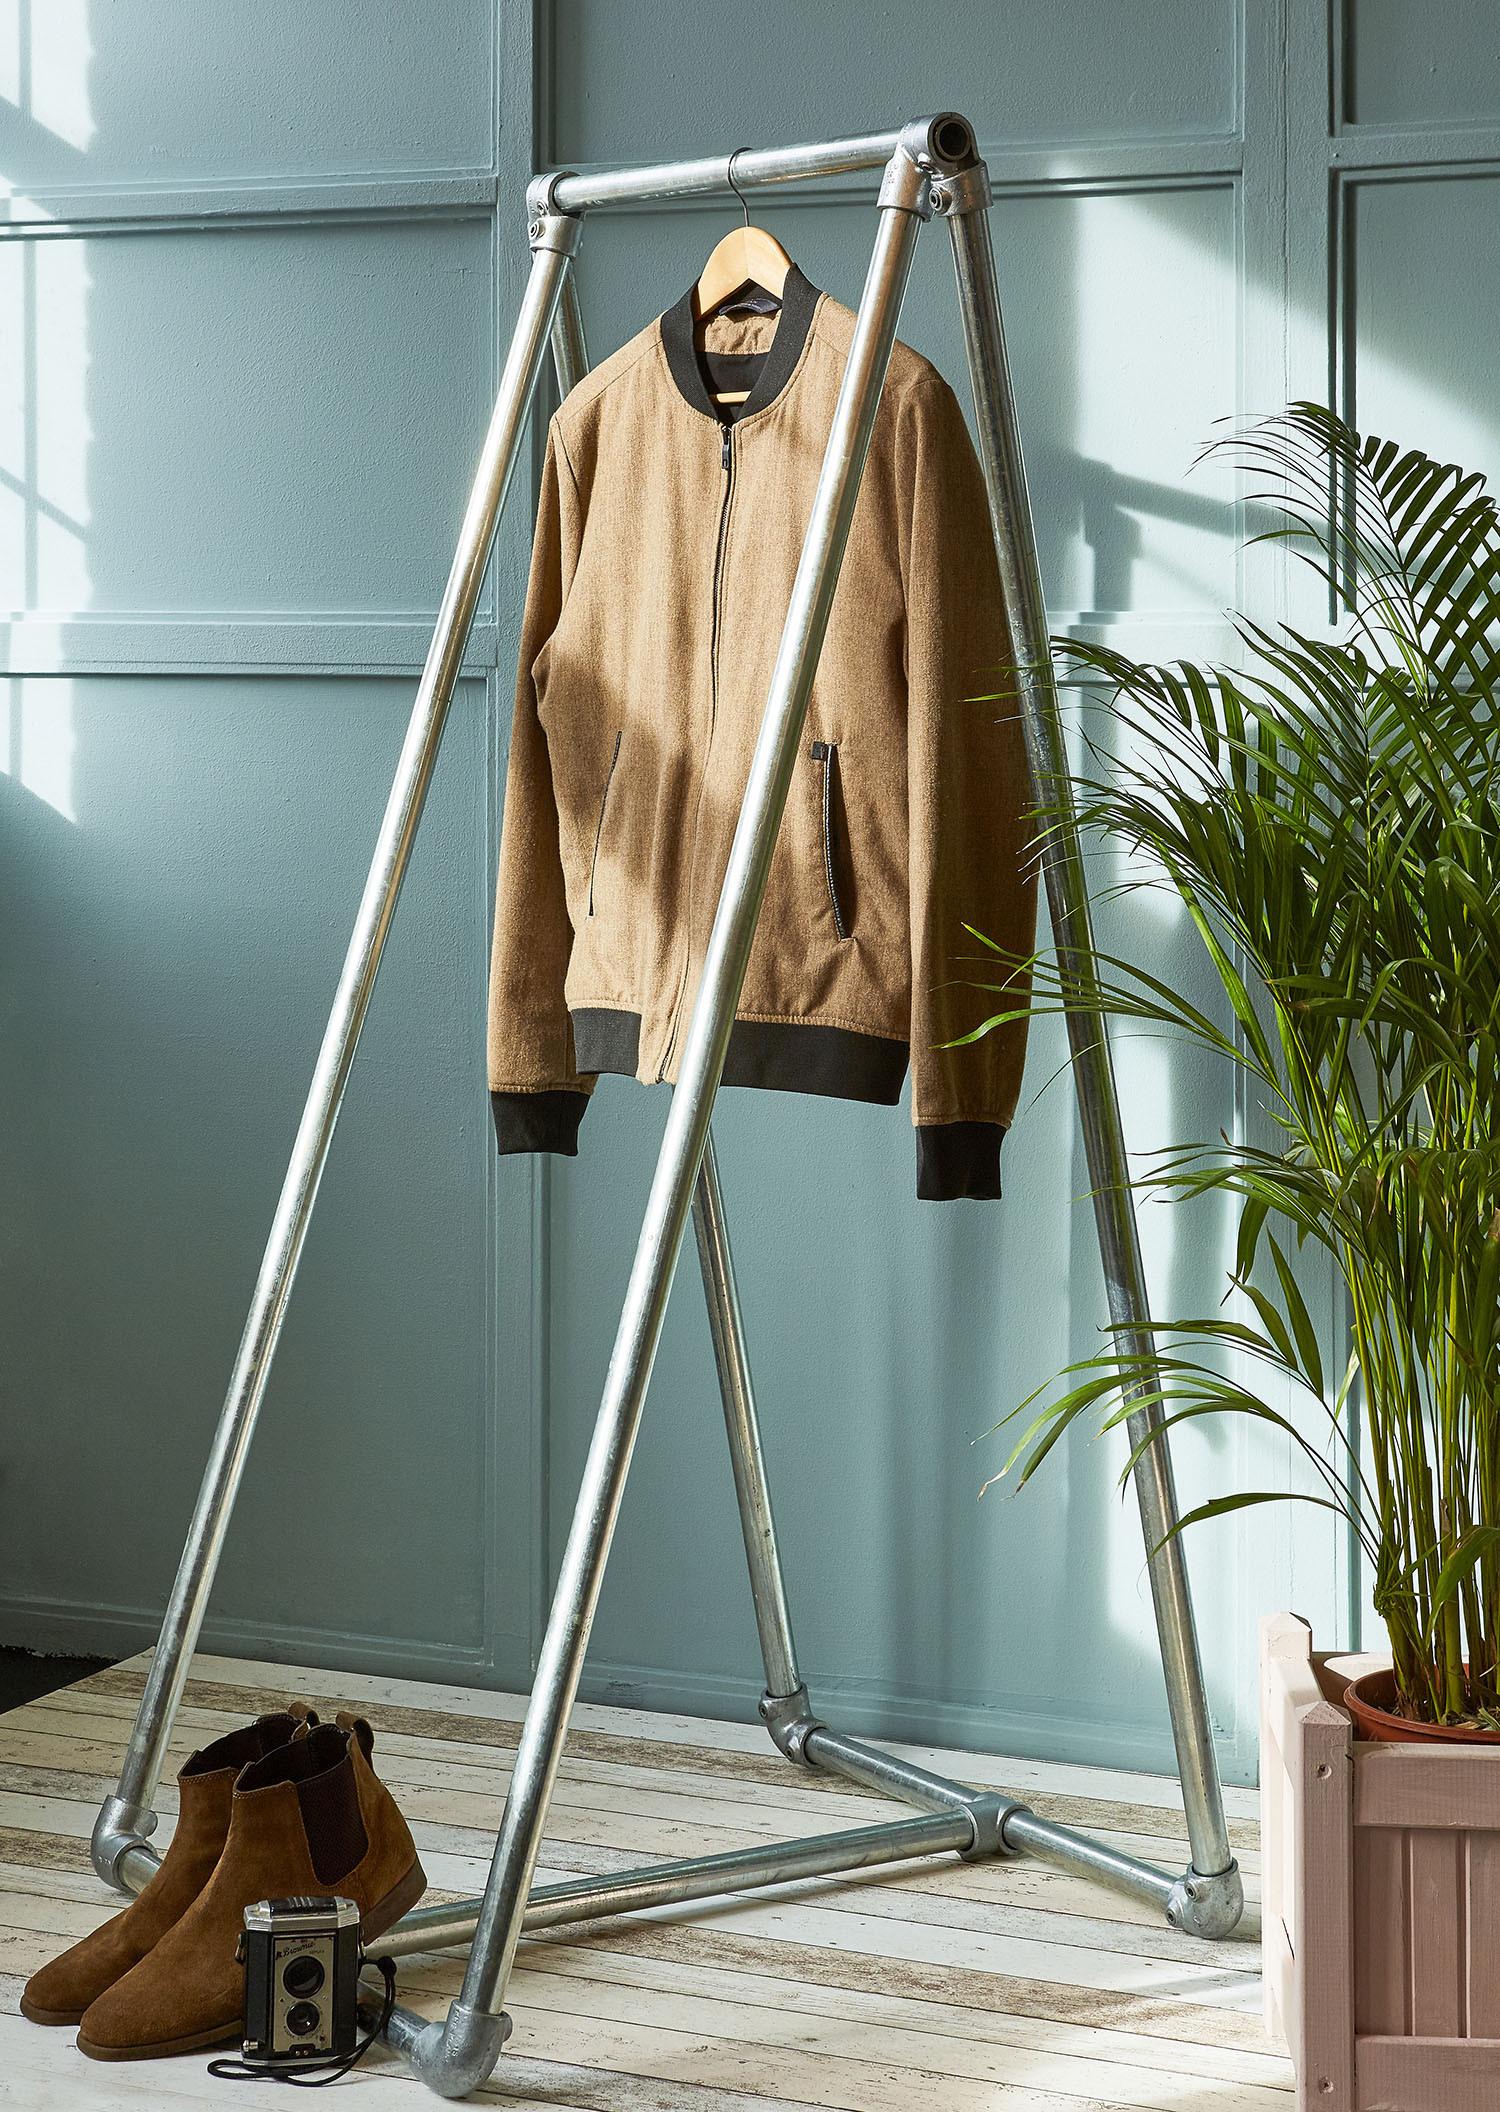 Freestanding A-frame clothing rail